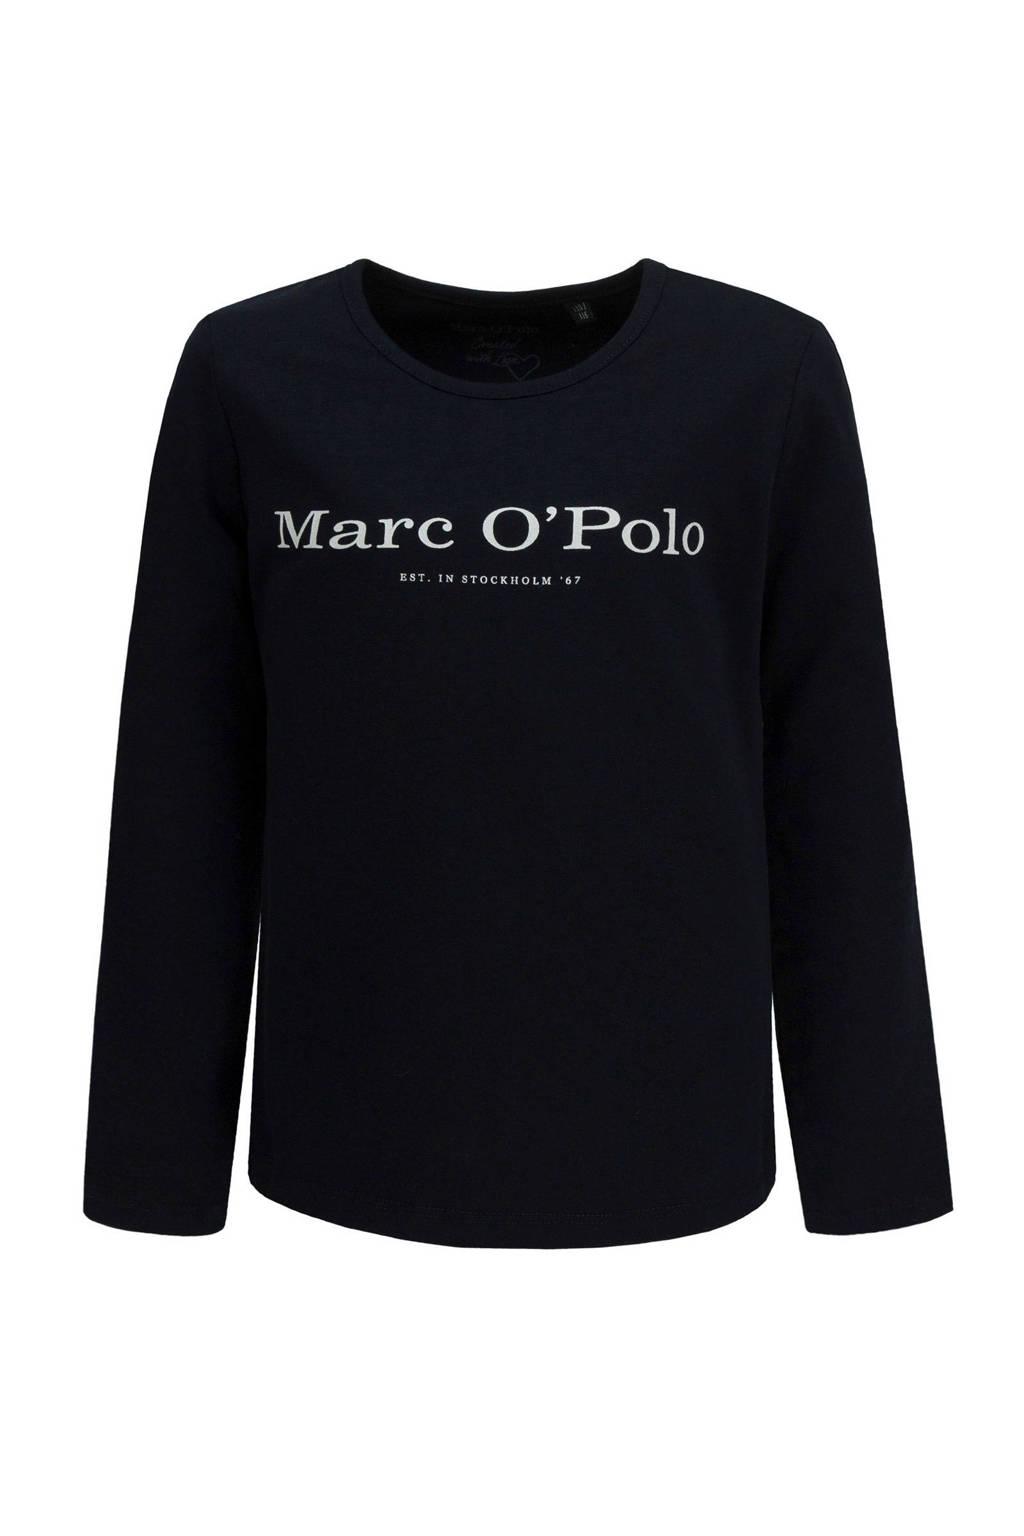 Marc O'Polo longsleeve met logo donkerblauw, Donkerblauw